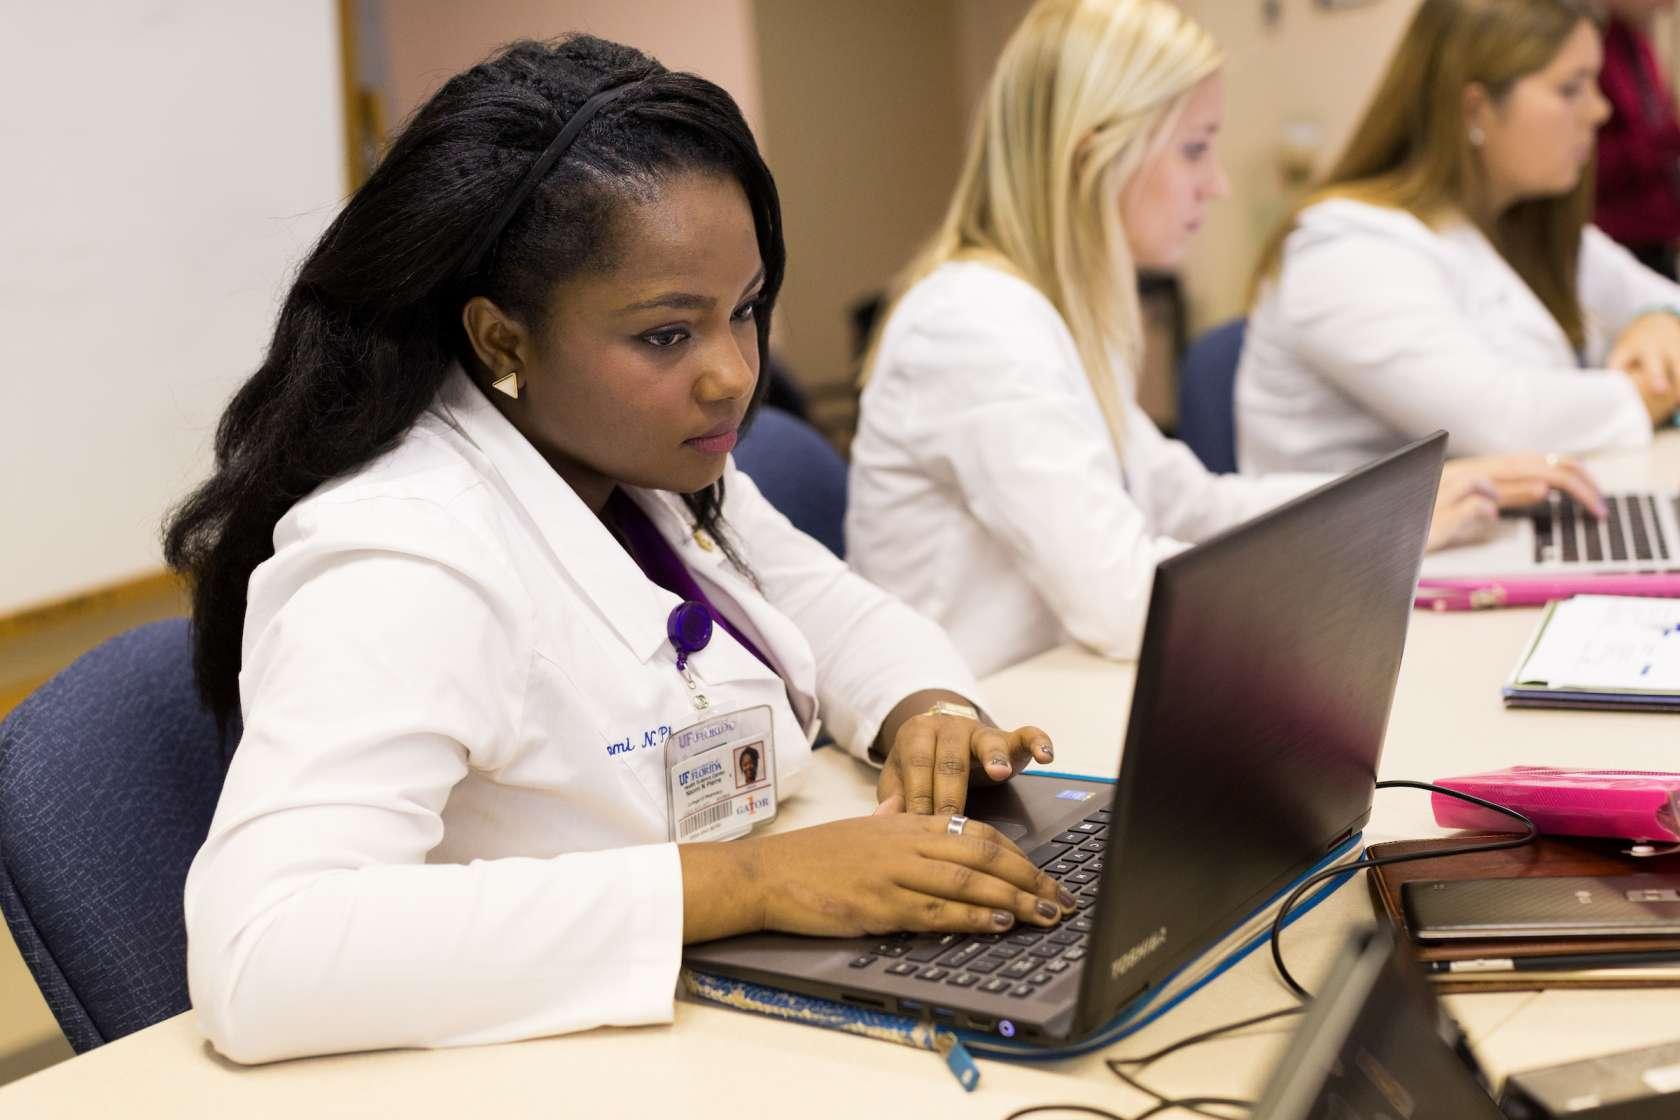 young black woman at a computer